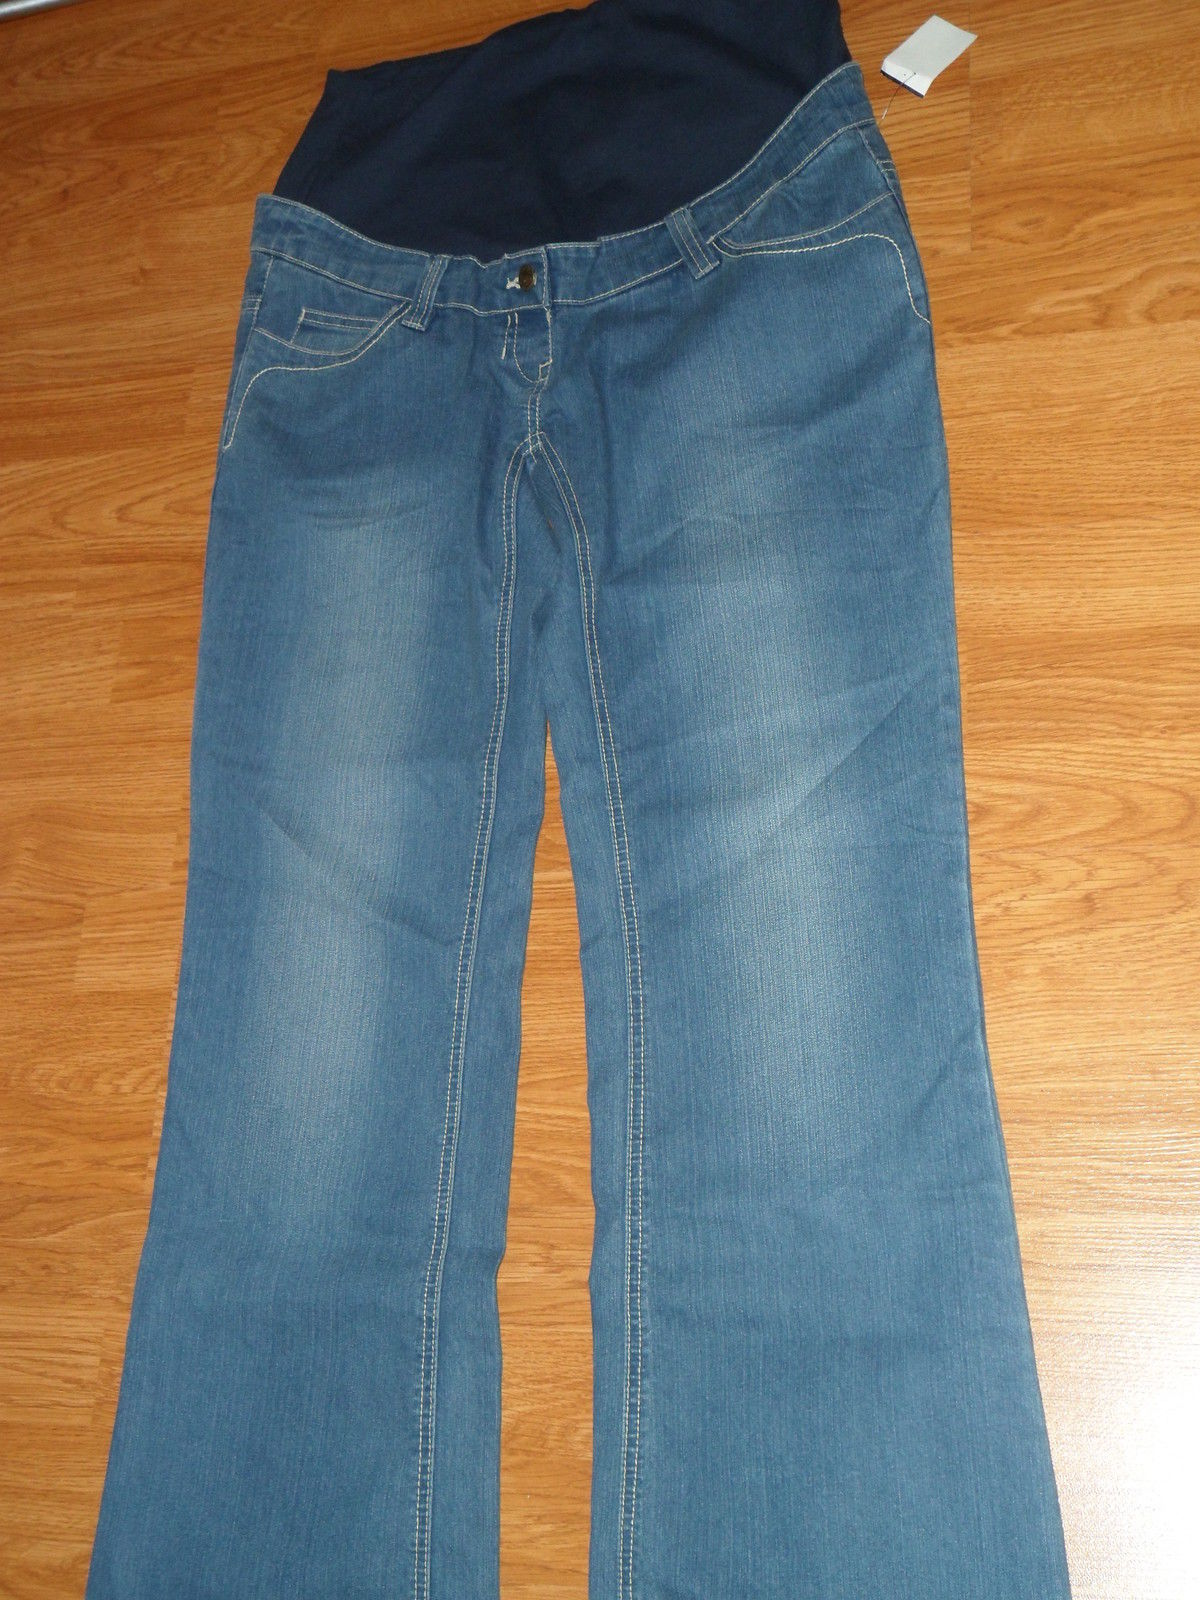 b620e51399d2c Calin Kalin Maternity Jeans Size 10 and 50 similar items